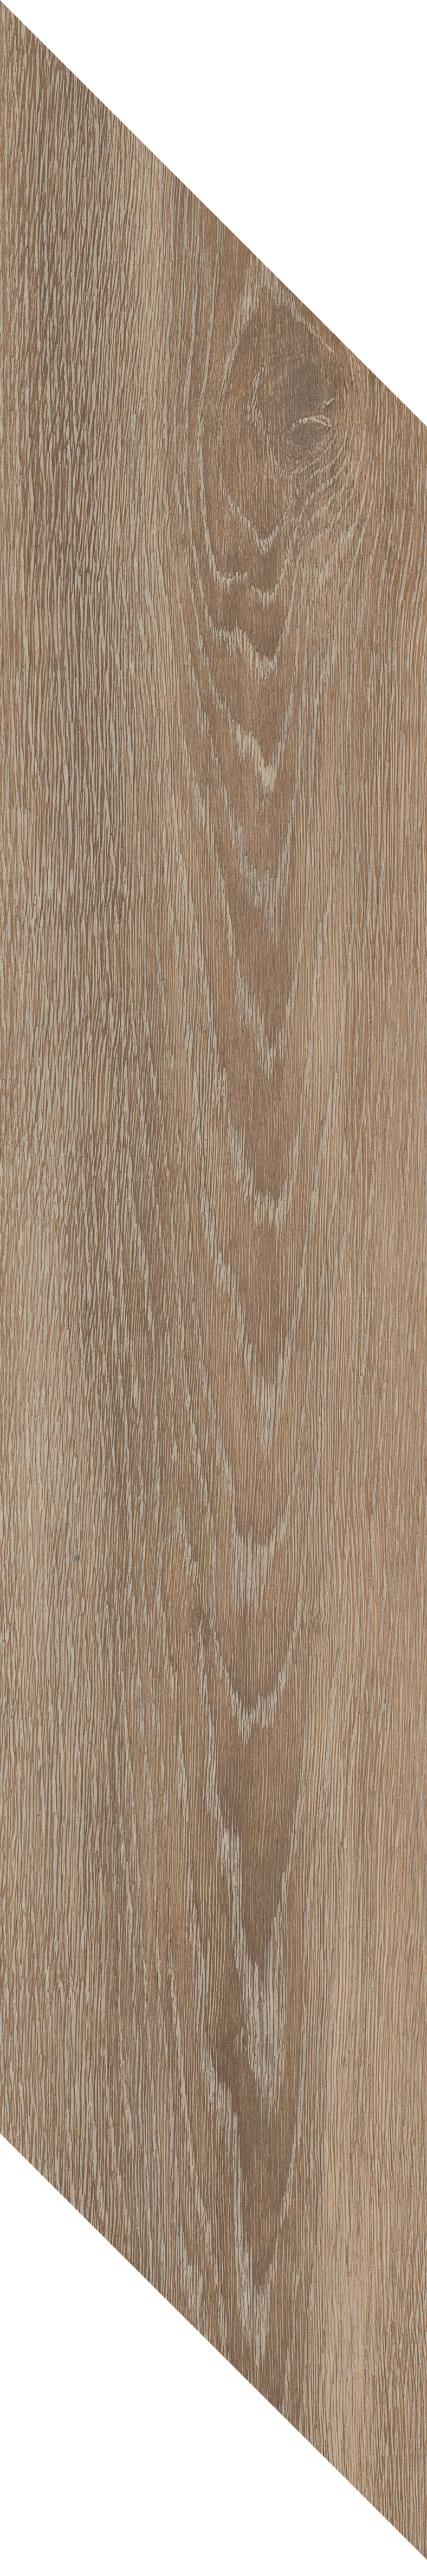 Parva Oak Chevron Calabria